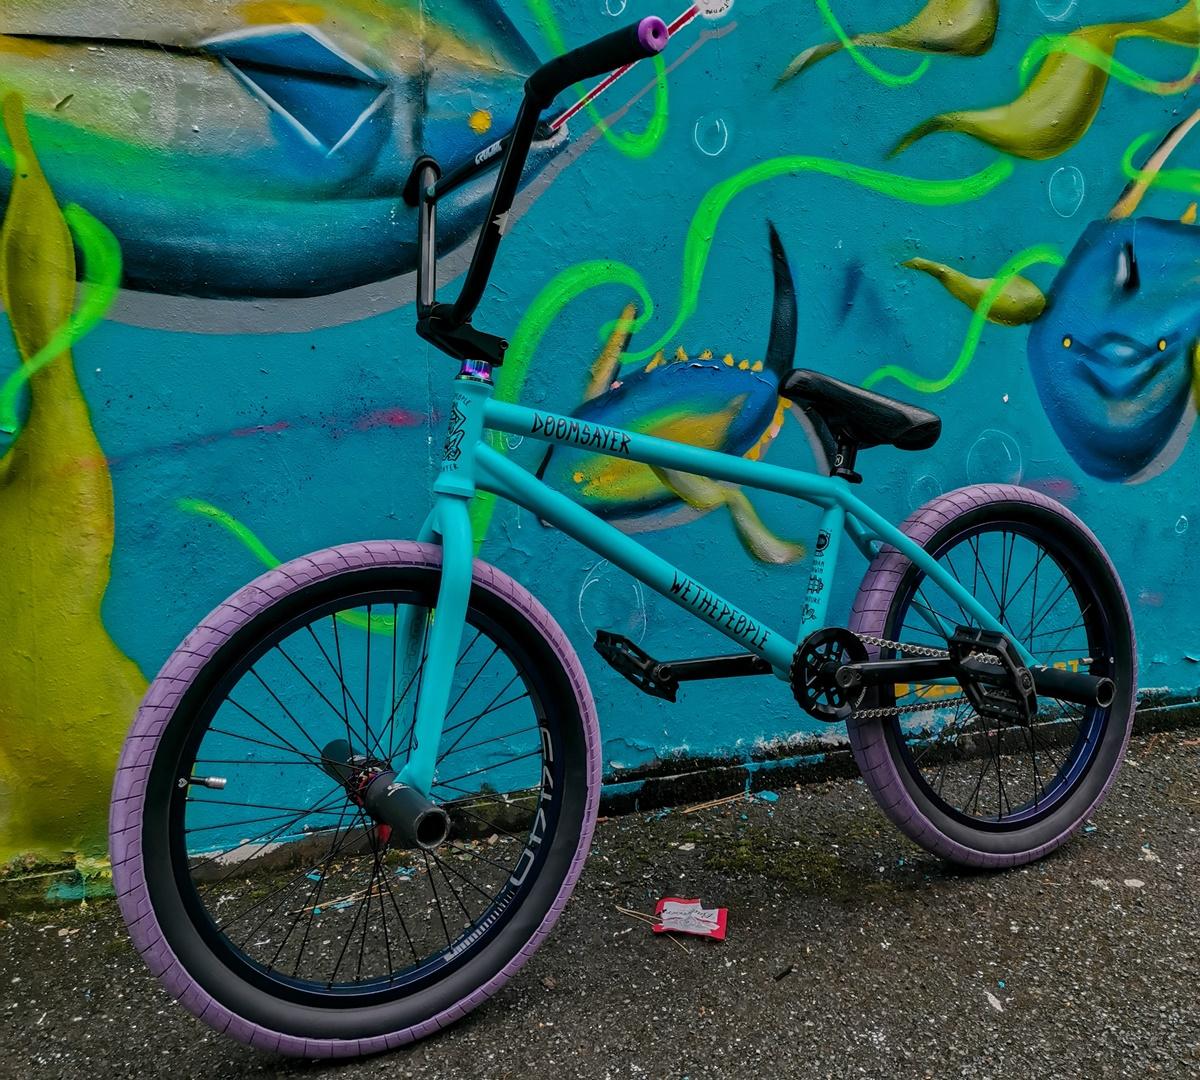 wethepeople bmx bike doomsayer